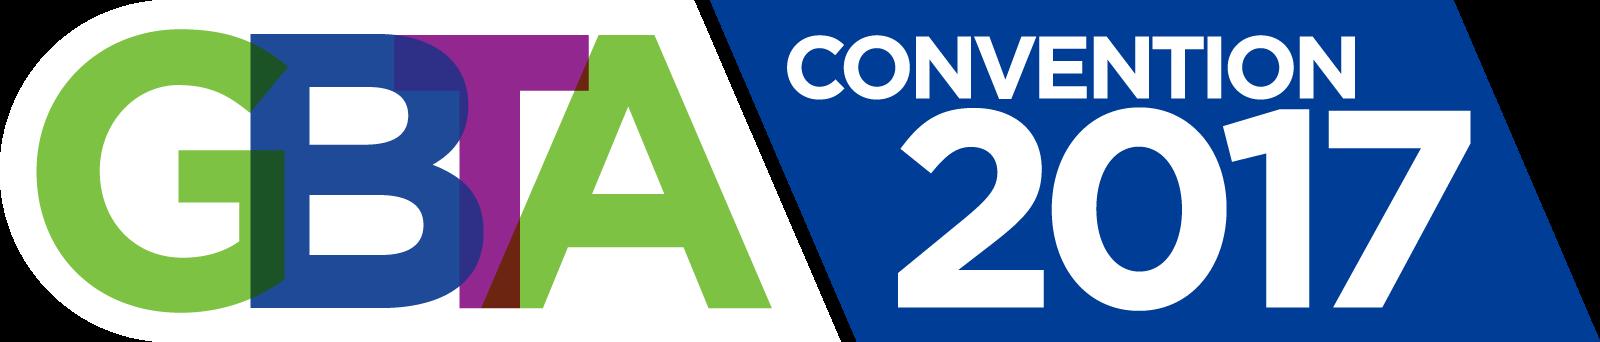 GBTA_Convention2017